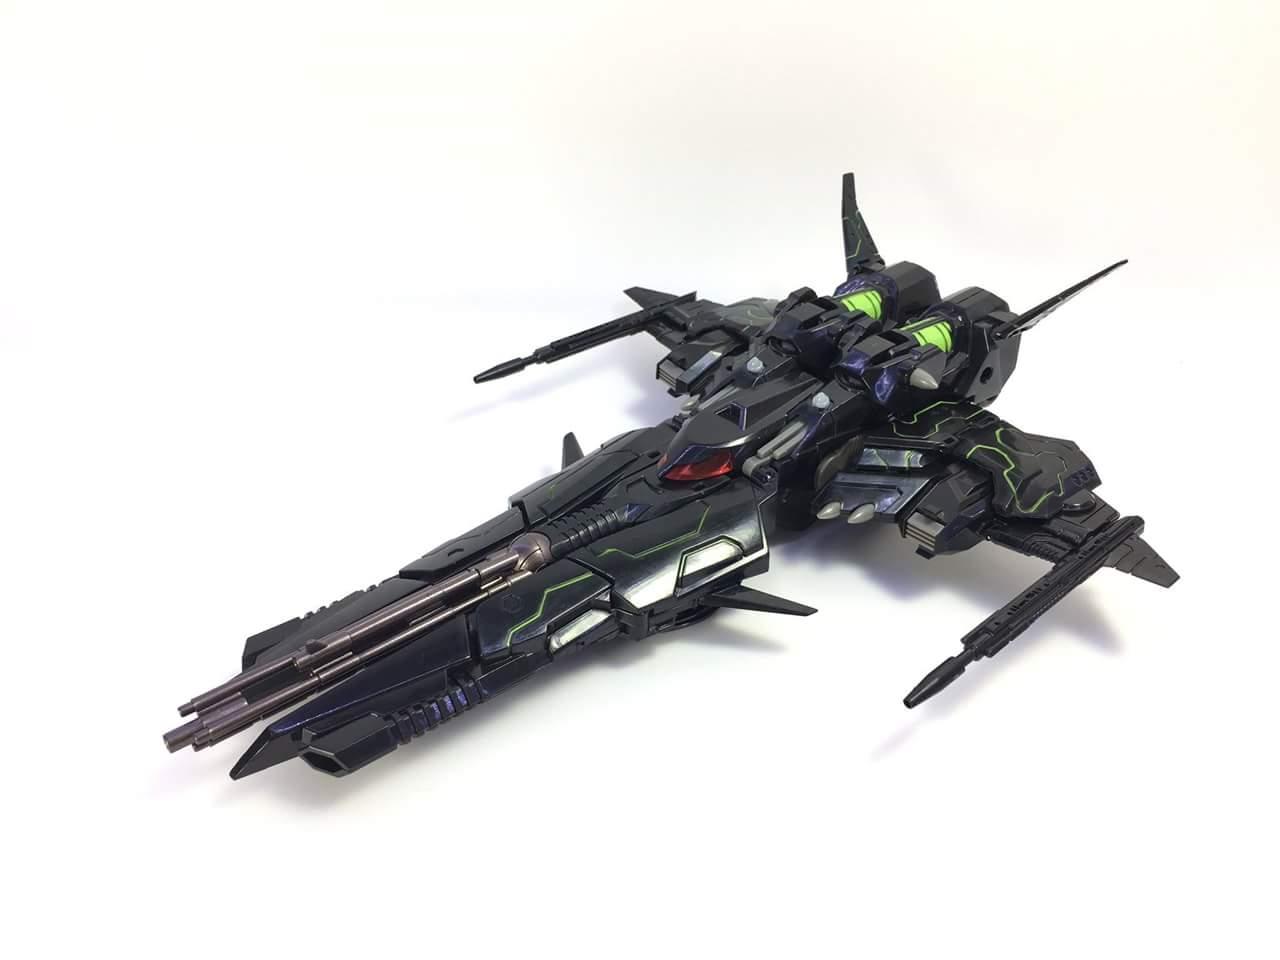 [Mastermind Creations] Produit Tiers - R-15 Jaegertron - aka Lockdown des BD IDW - Page 2 PIsHR9V9